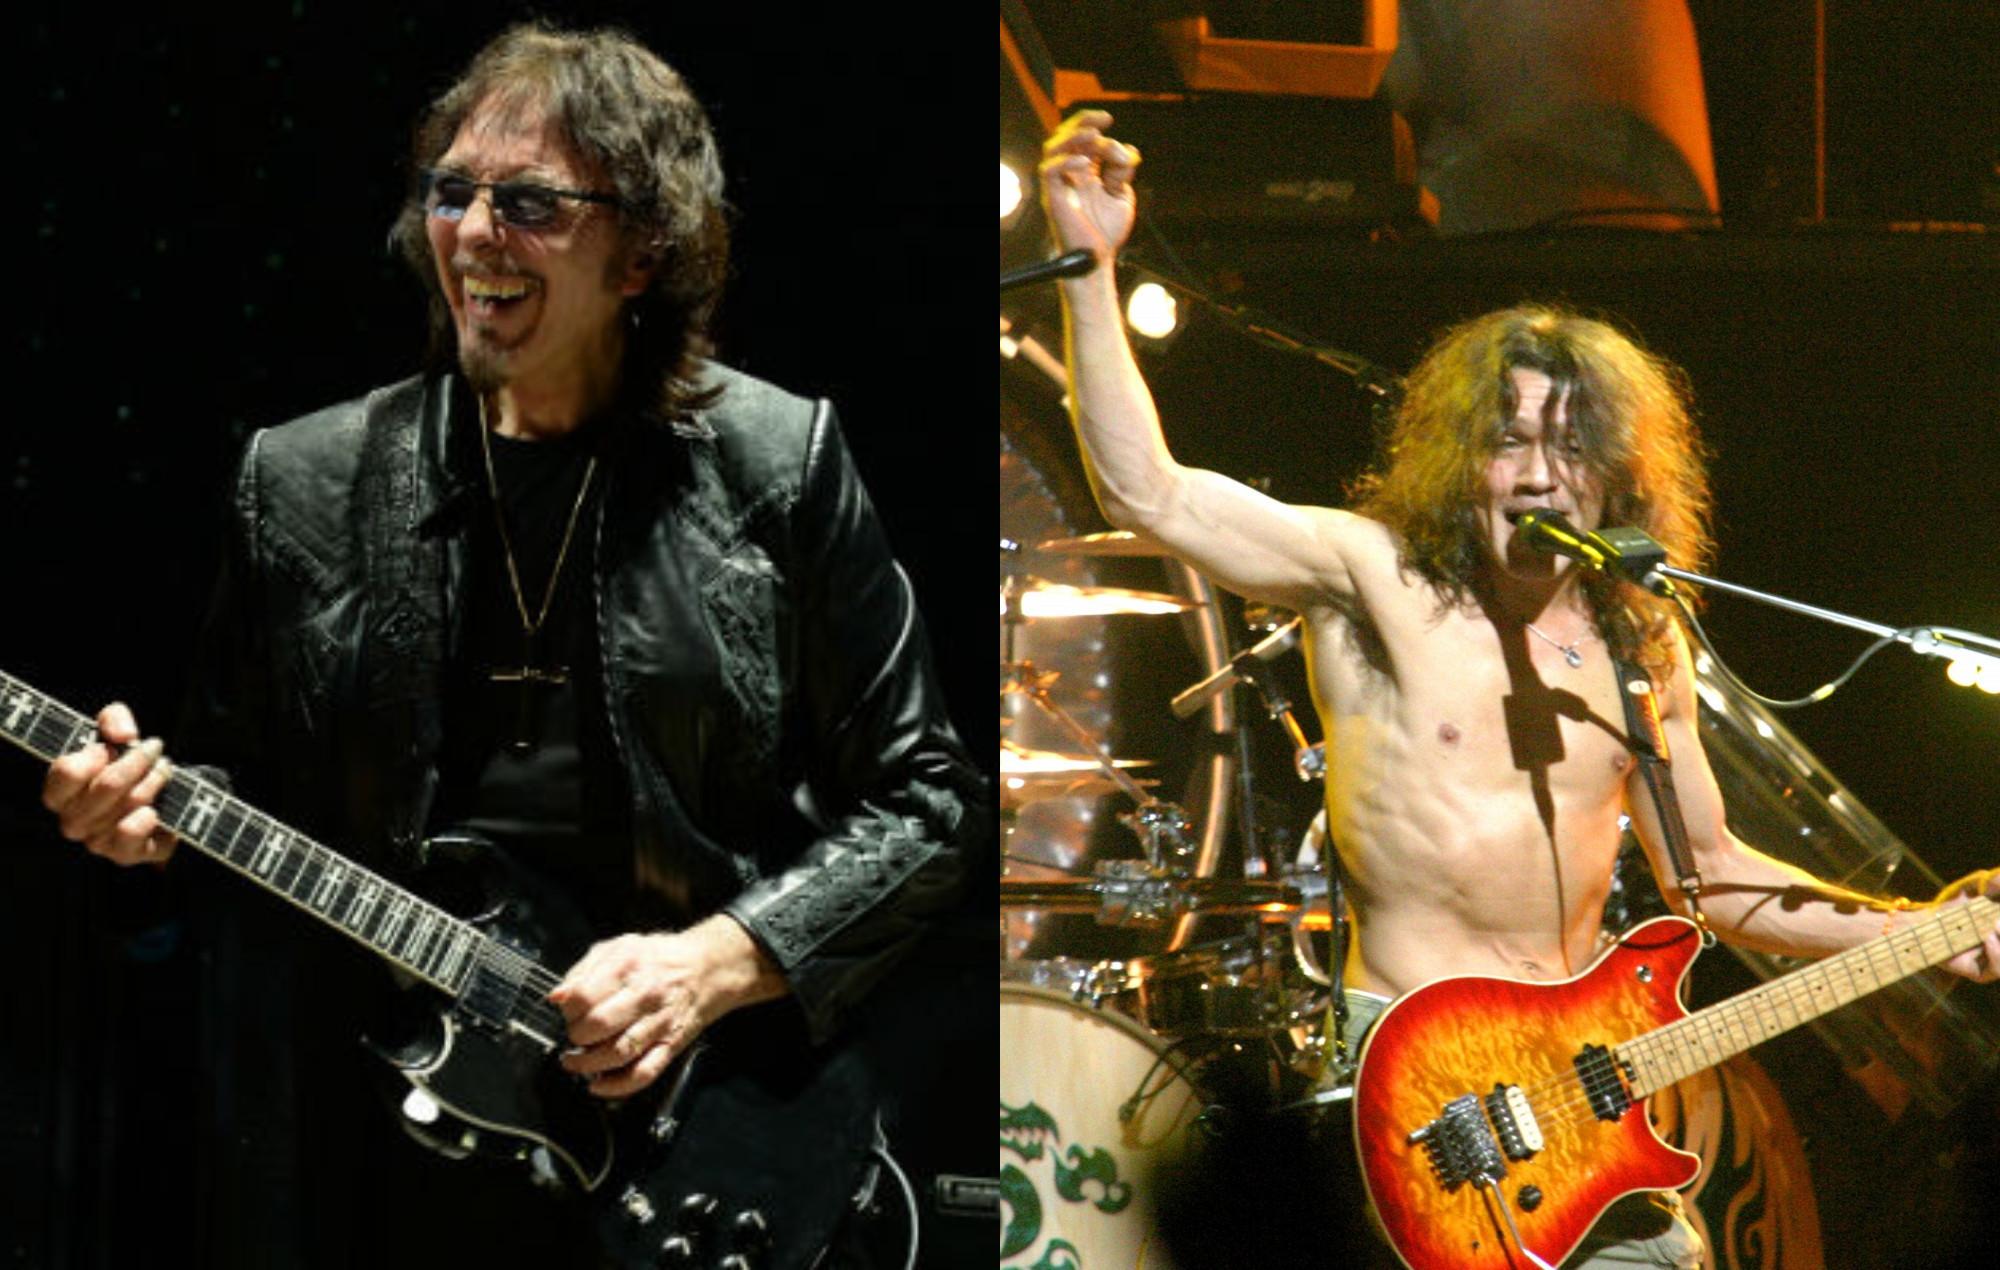 Tony Iommi, Eddie Van Halen